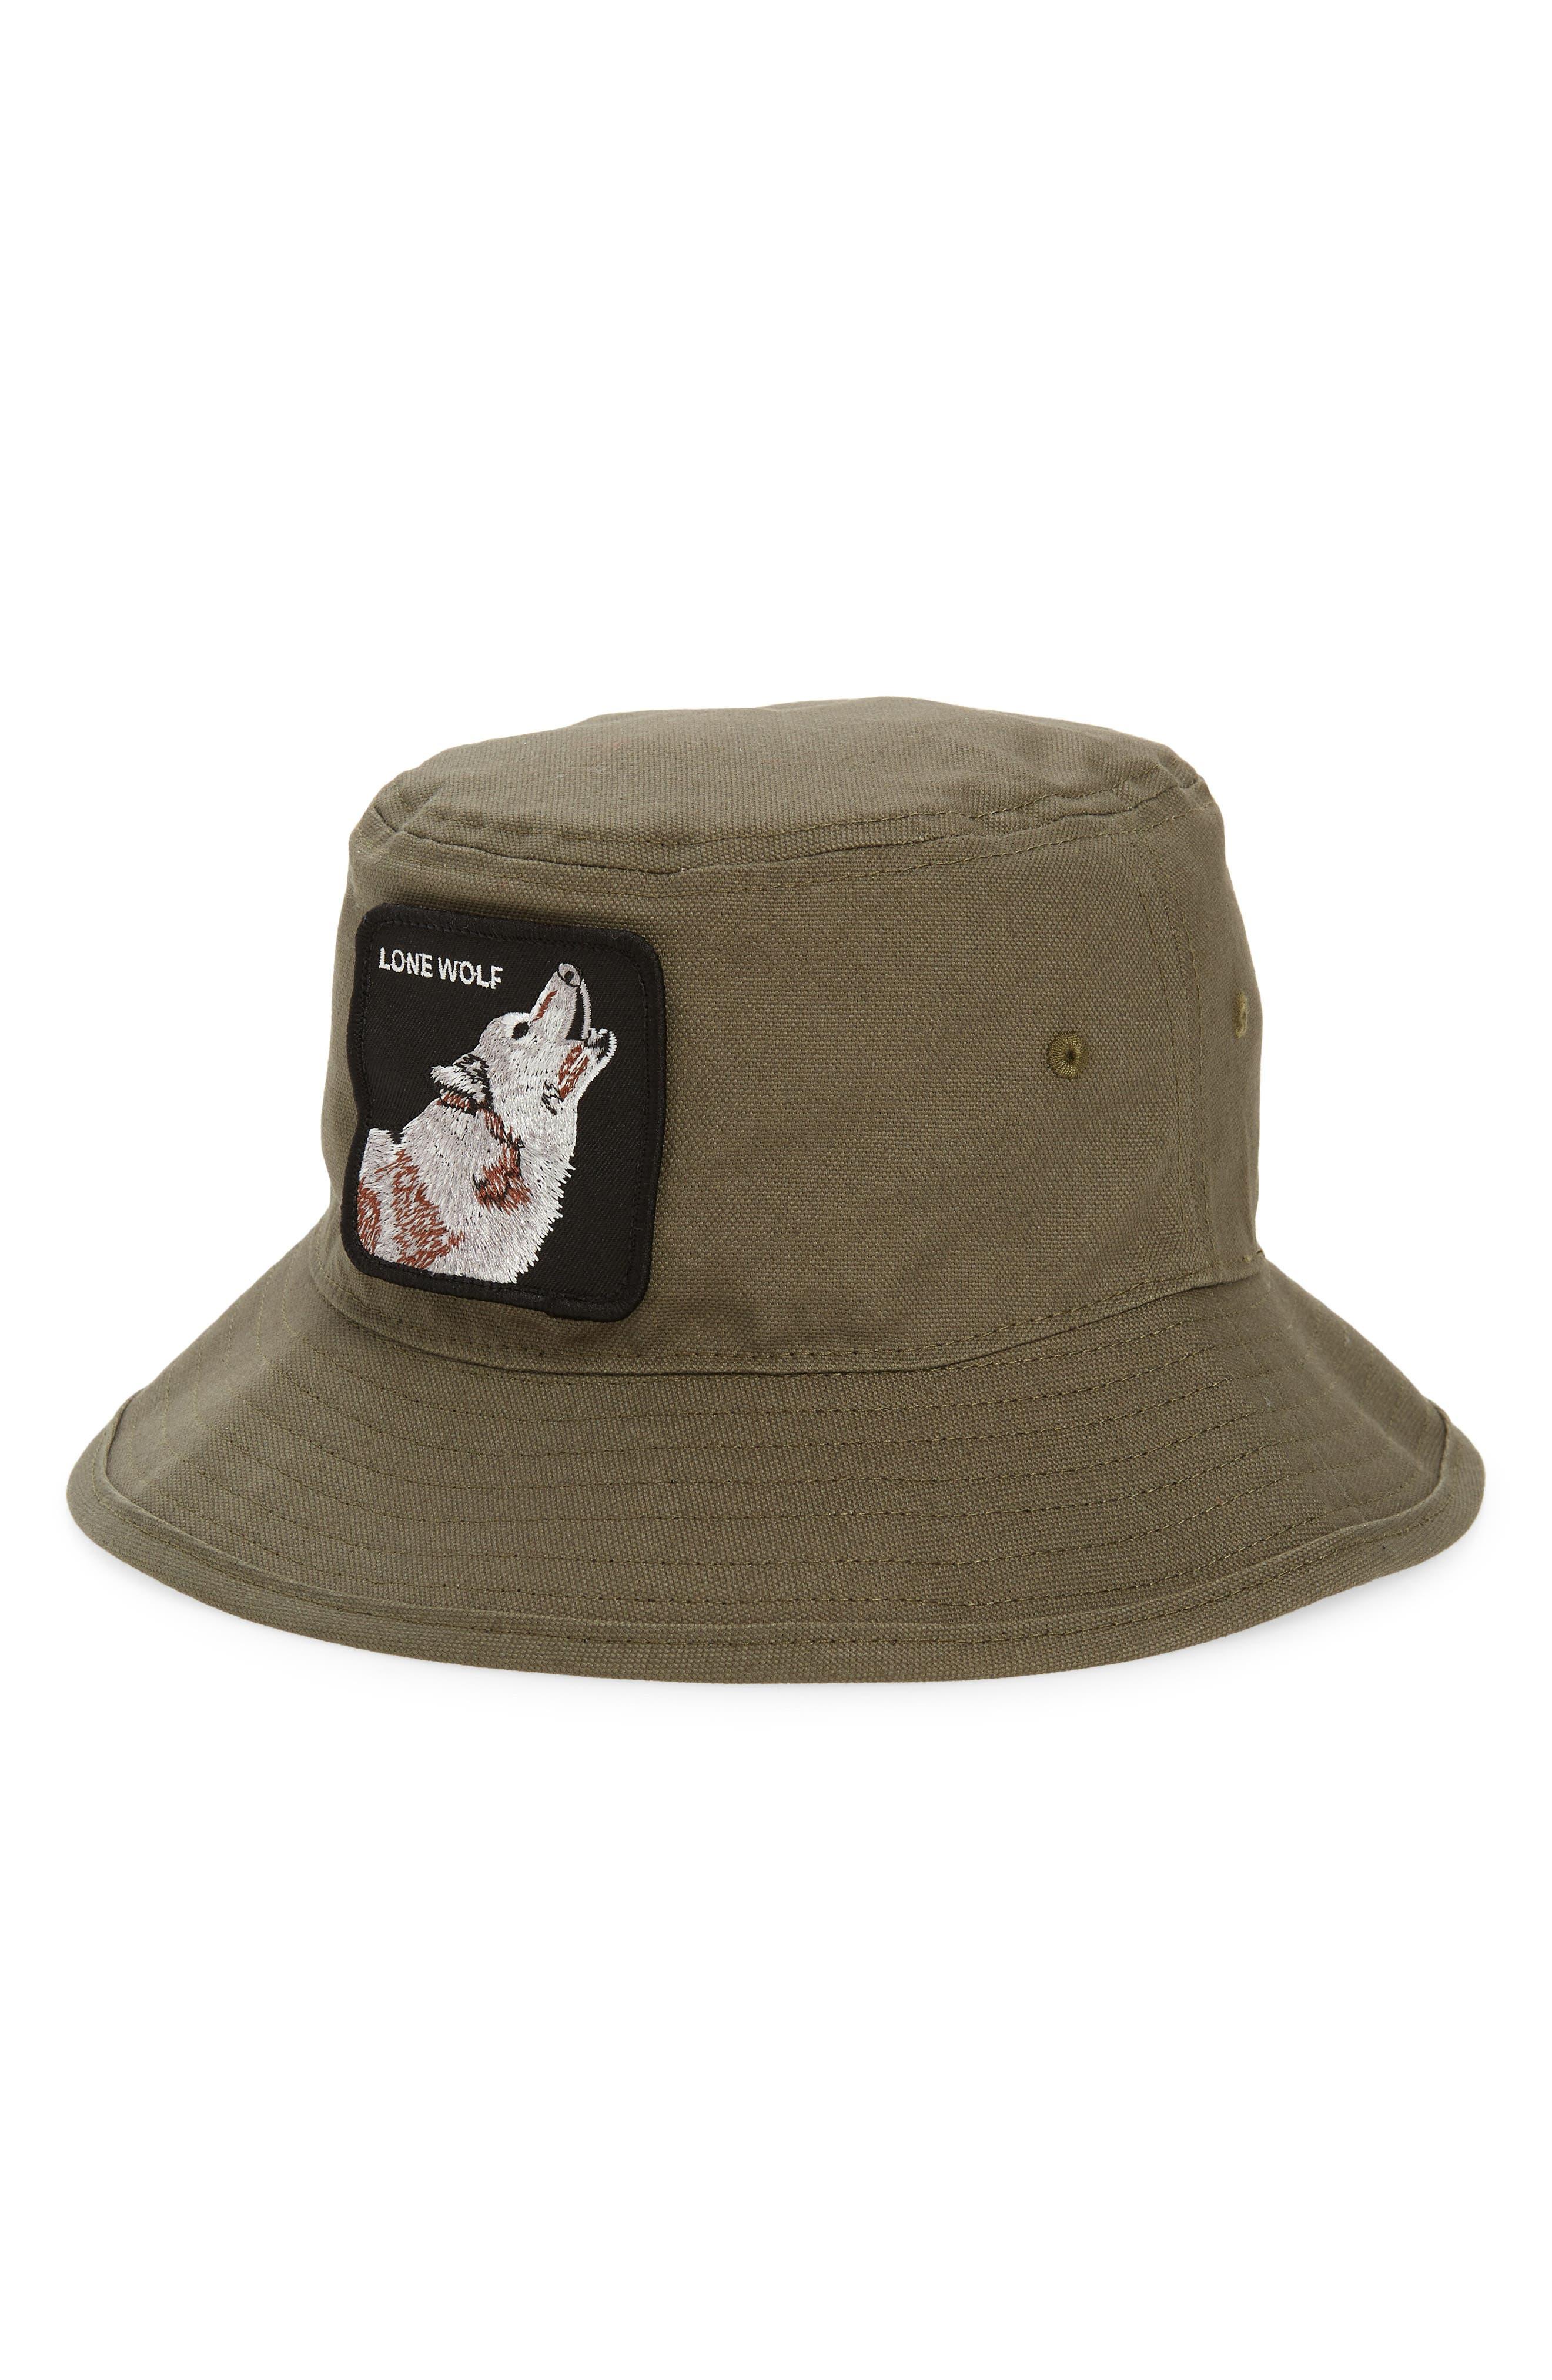 . Howl You Doing Bucket Hat